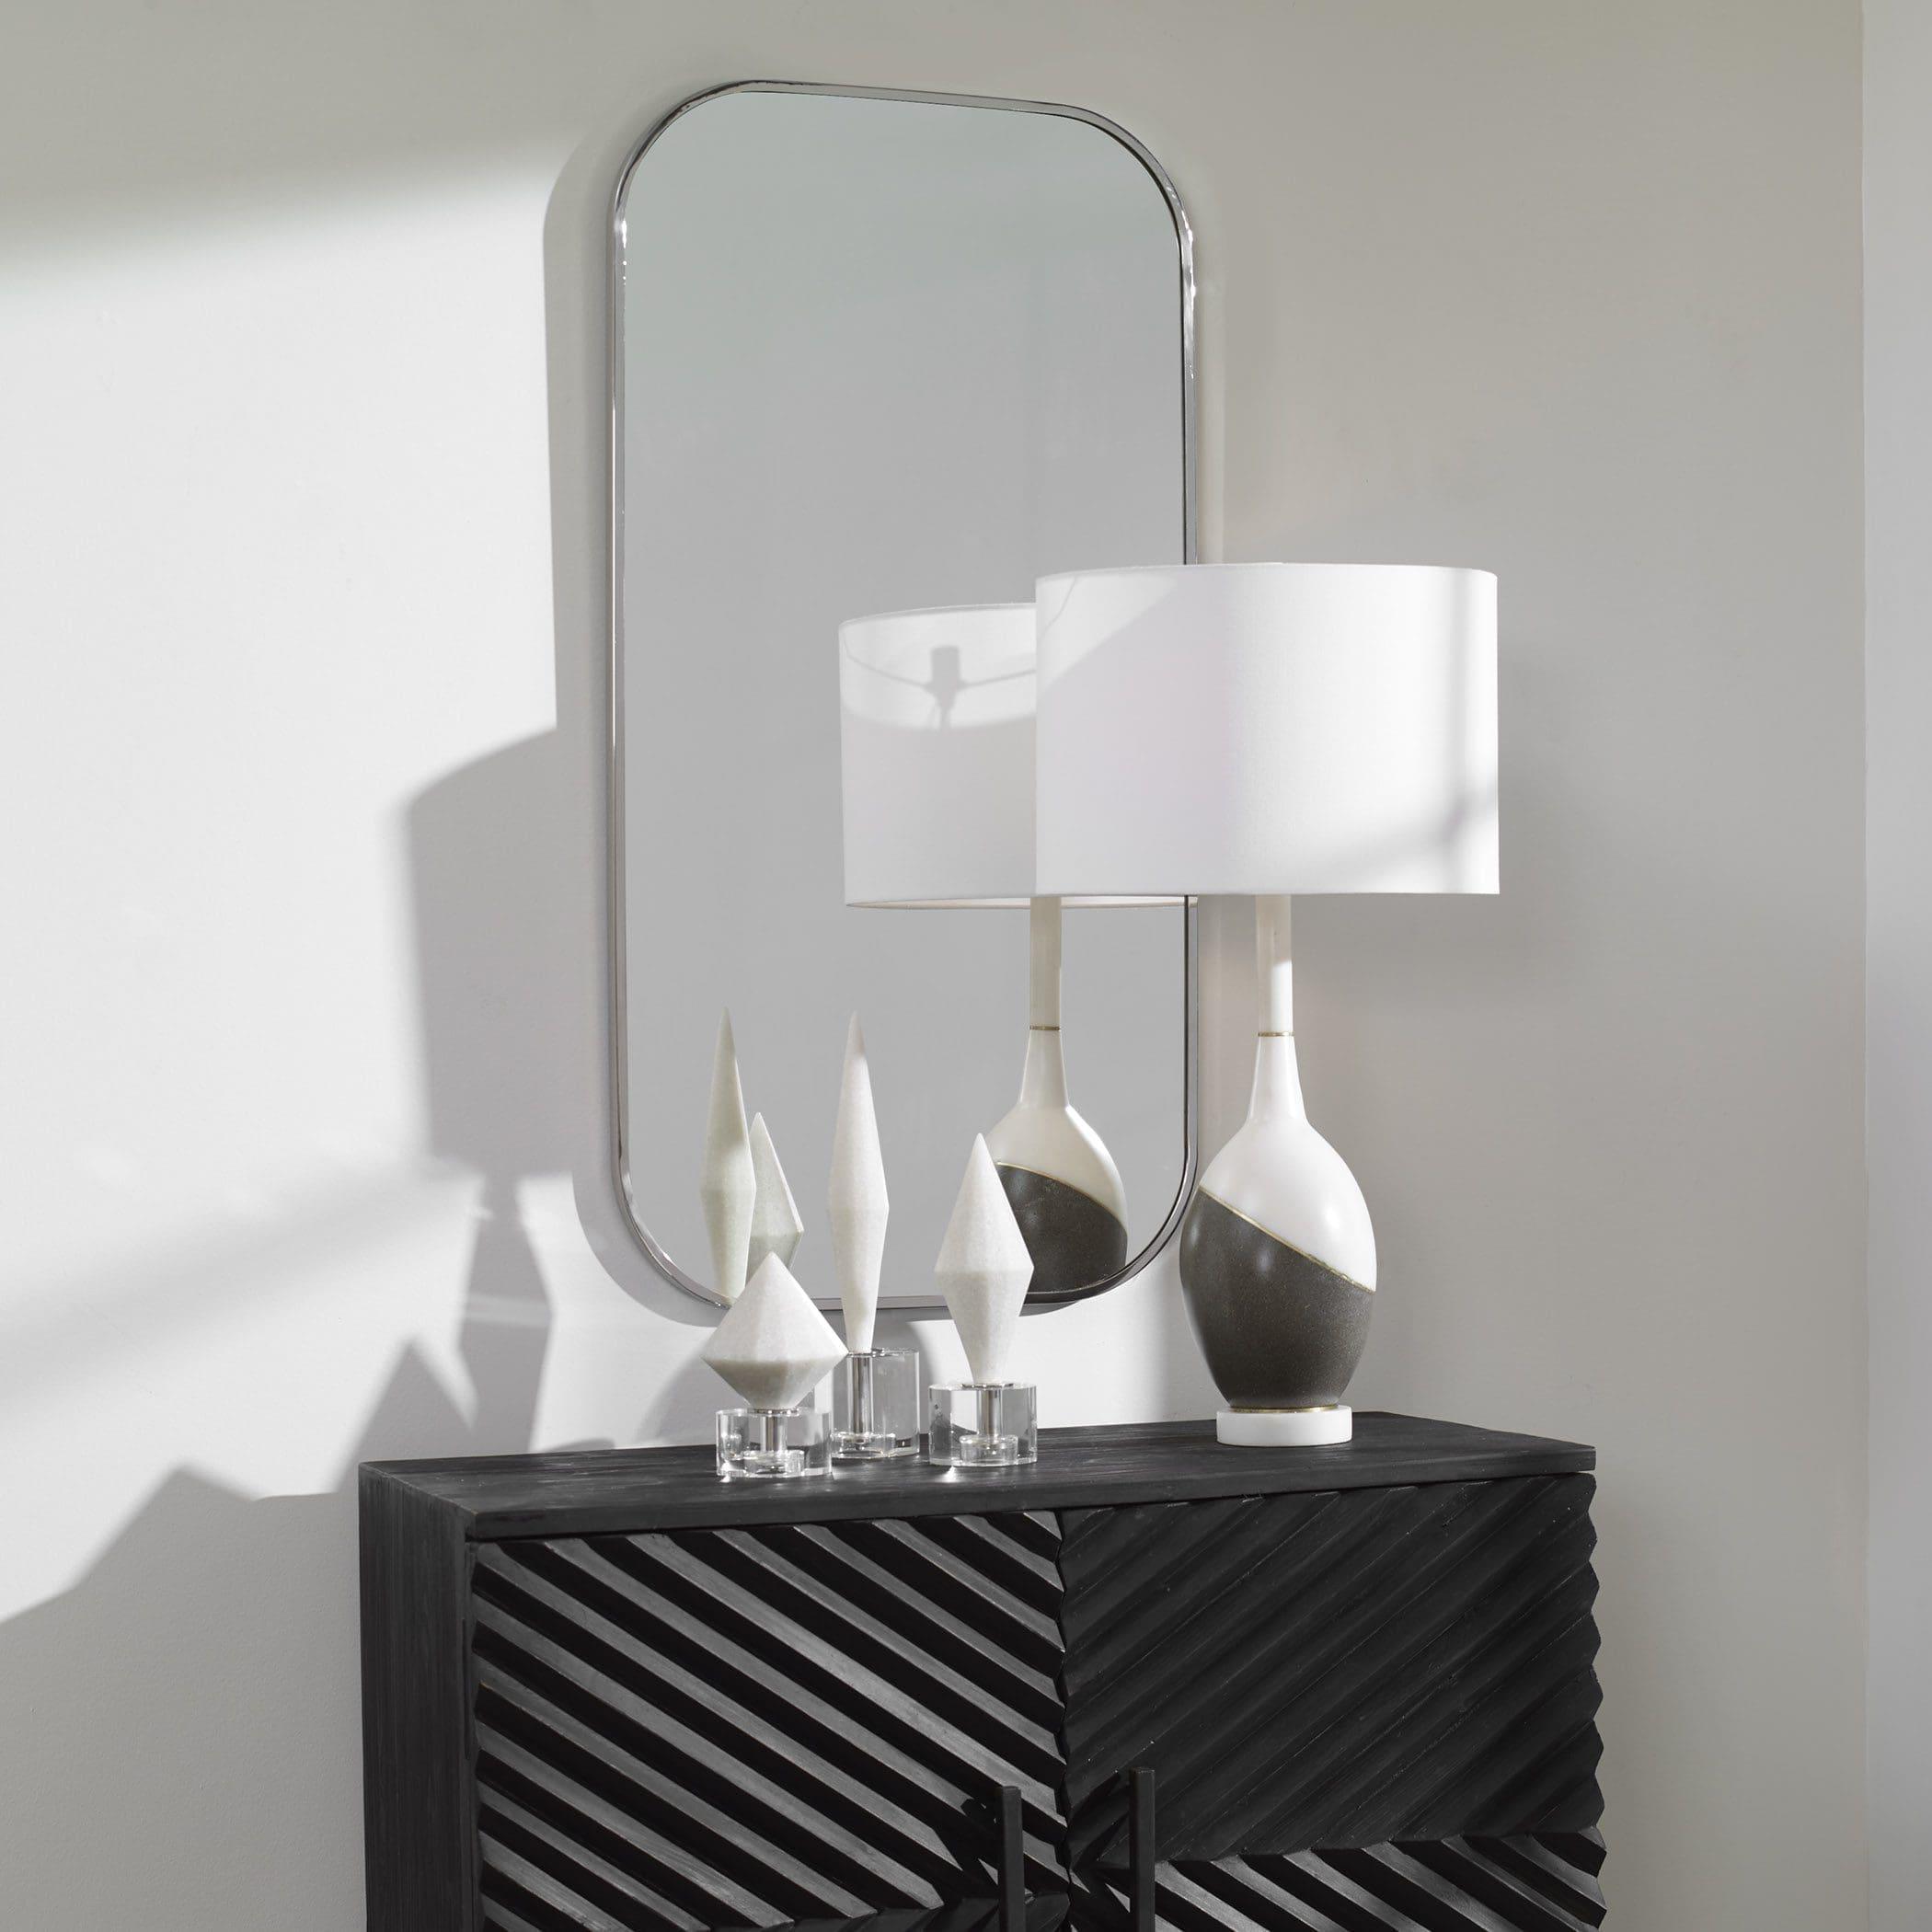 Uttermost Taft Polished Nickel Mirror